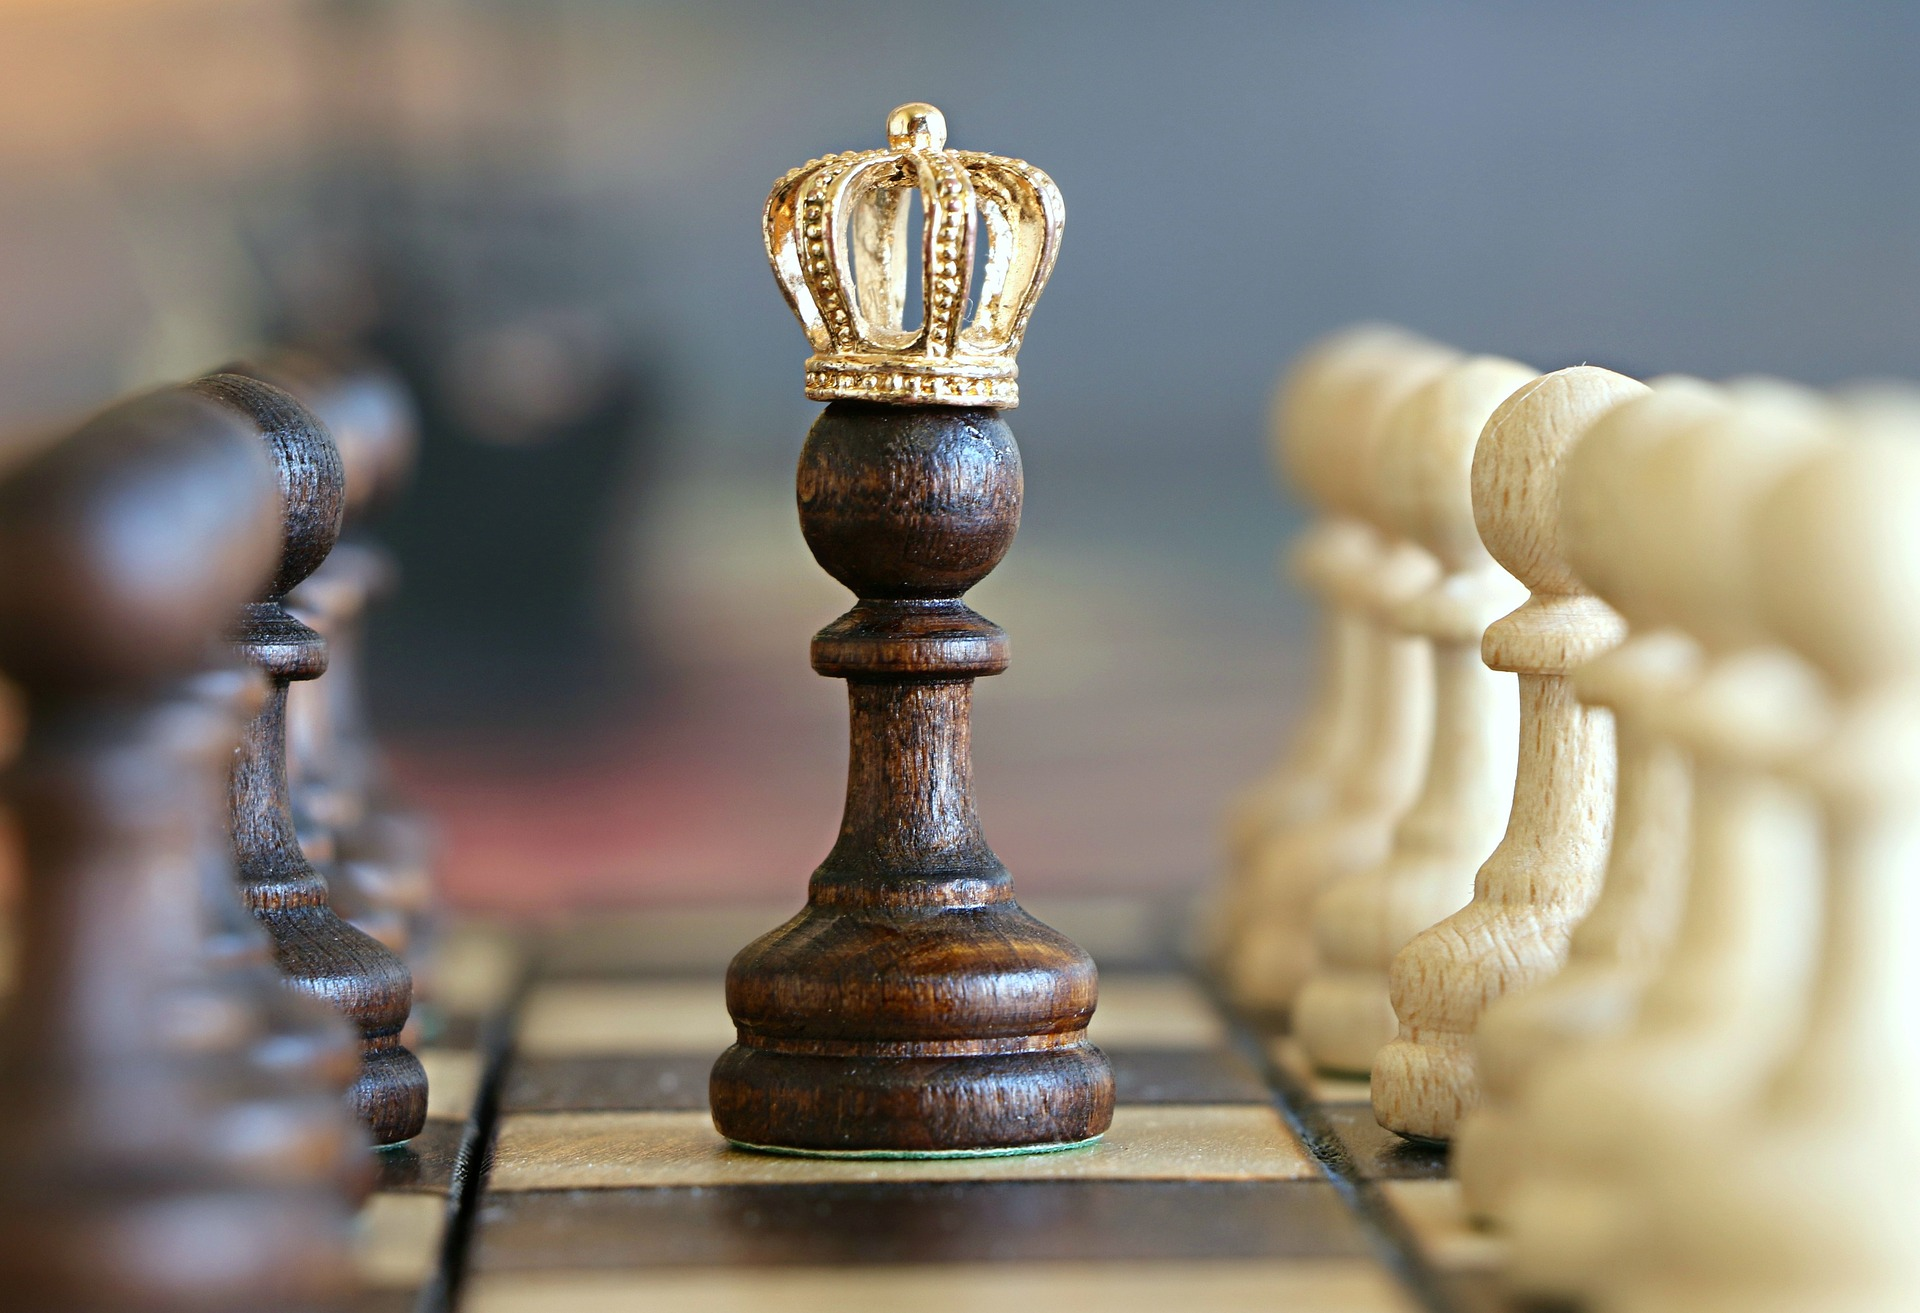 szachy pionek pionki pion piony promocja